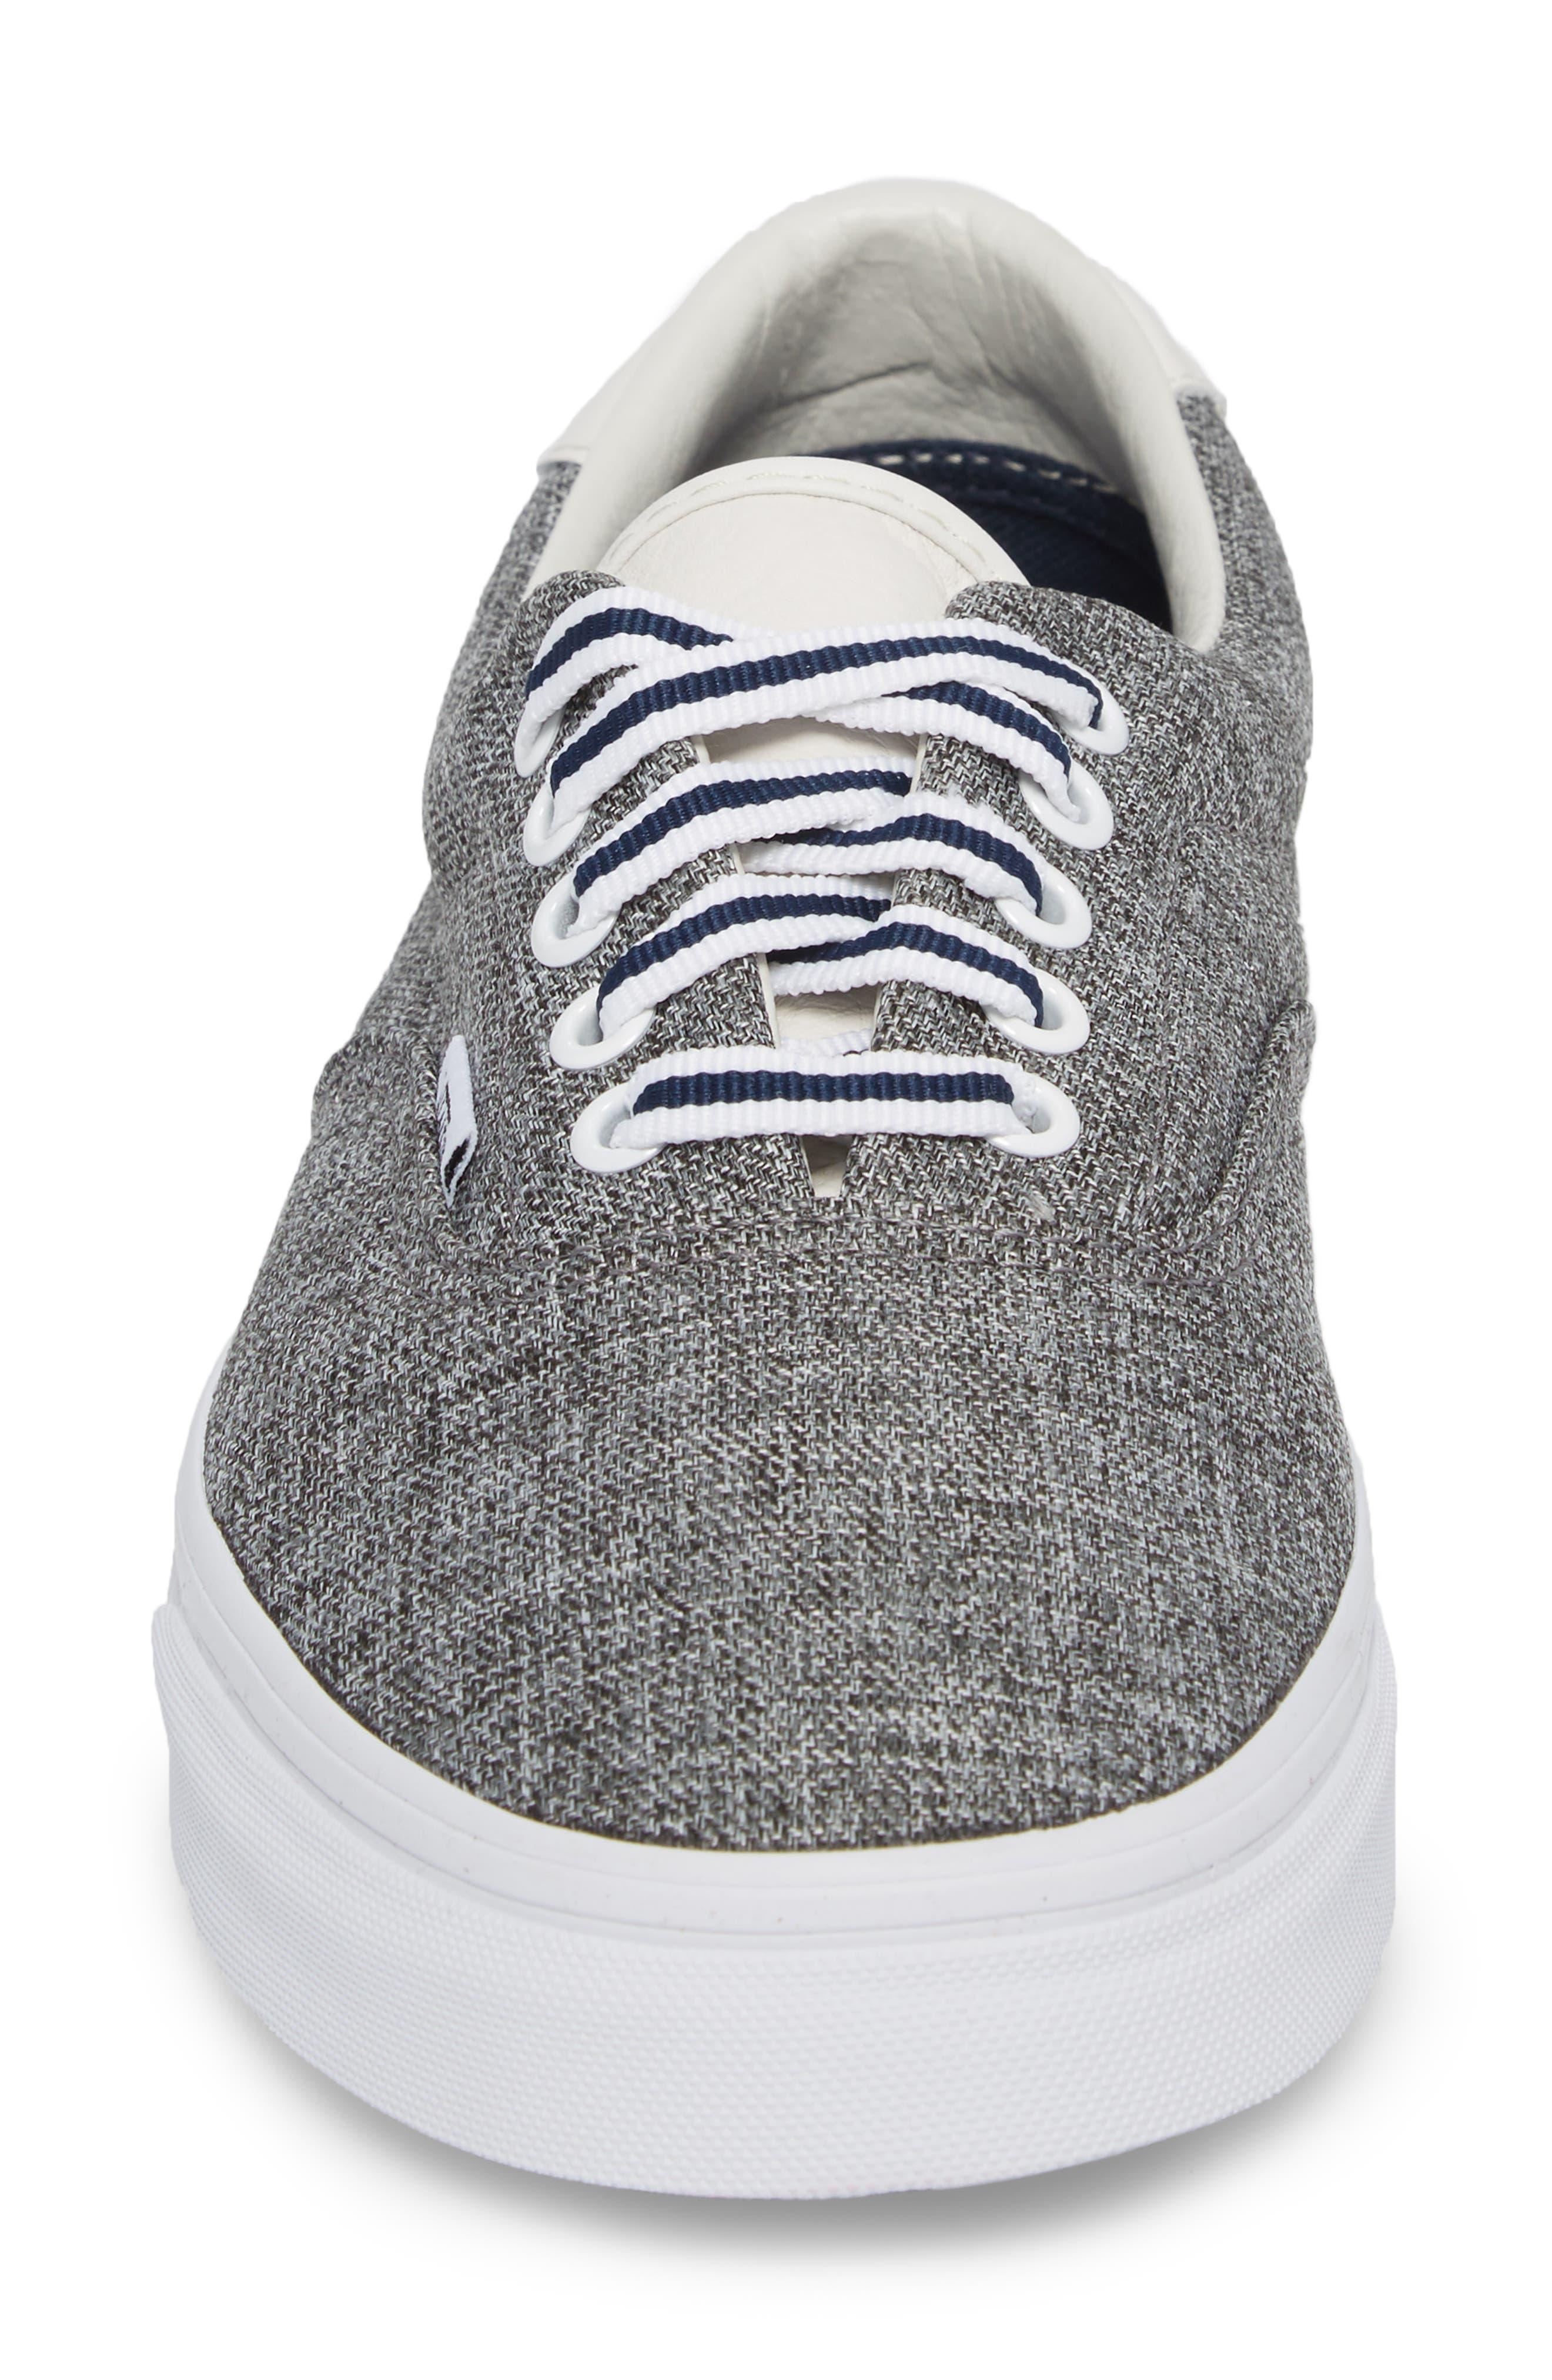 'Era 59' Sneaker,                             Alternate thumbnail 4, color,                             022